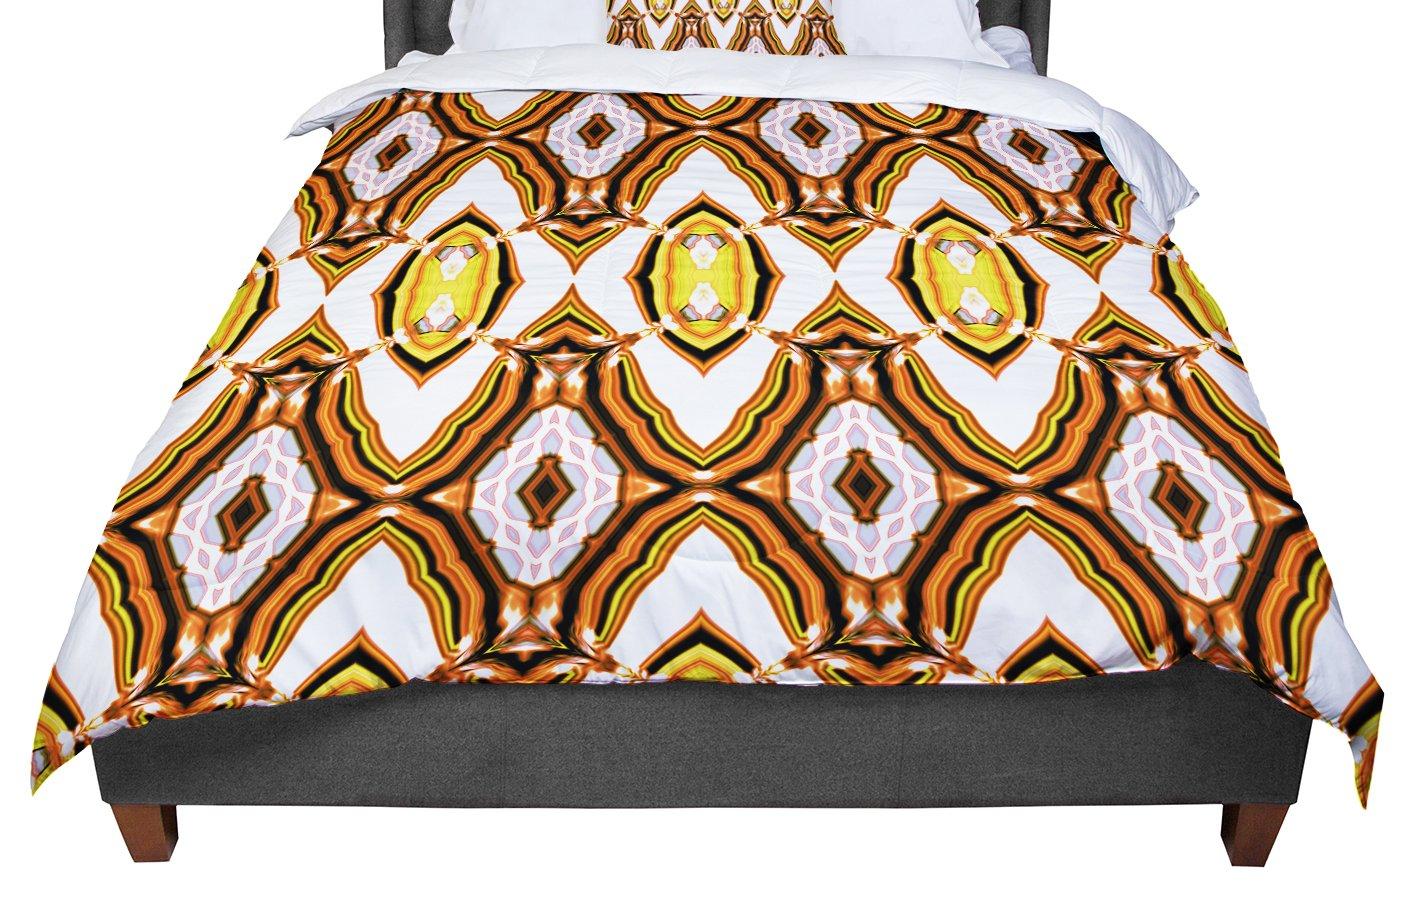 KESS InHouse Dawid Roc Inspired by Psychedelic Art 1 Orange Pattern Queen Comforter 88 X 88